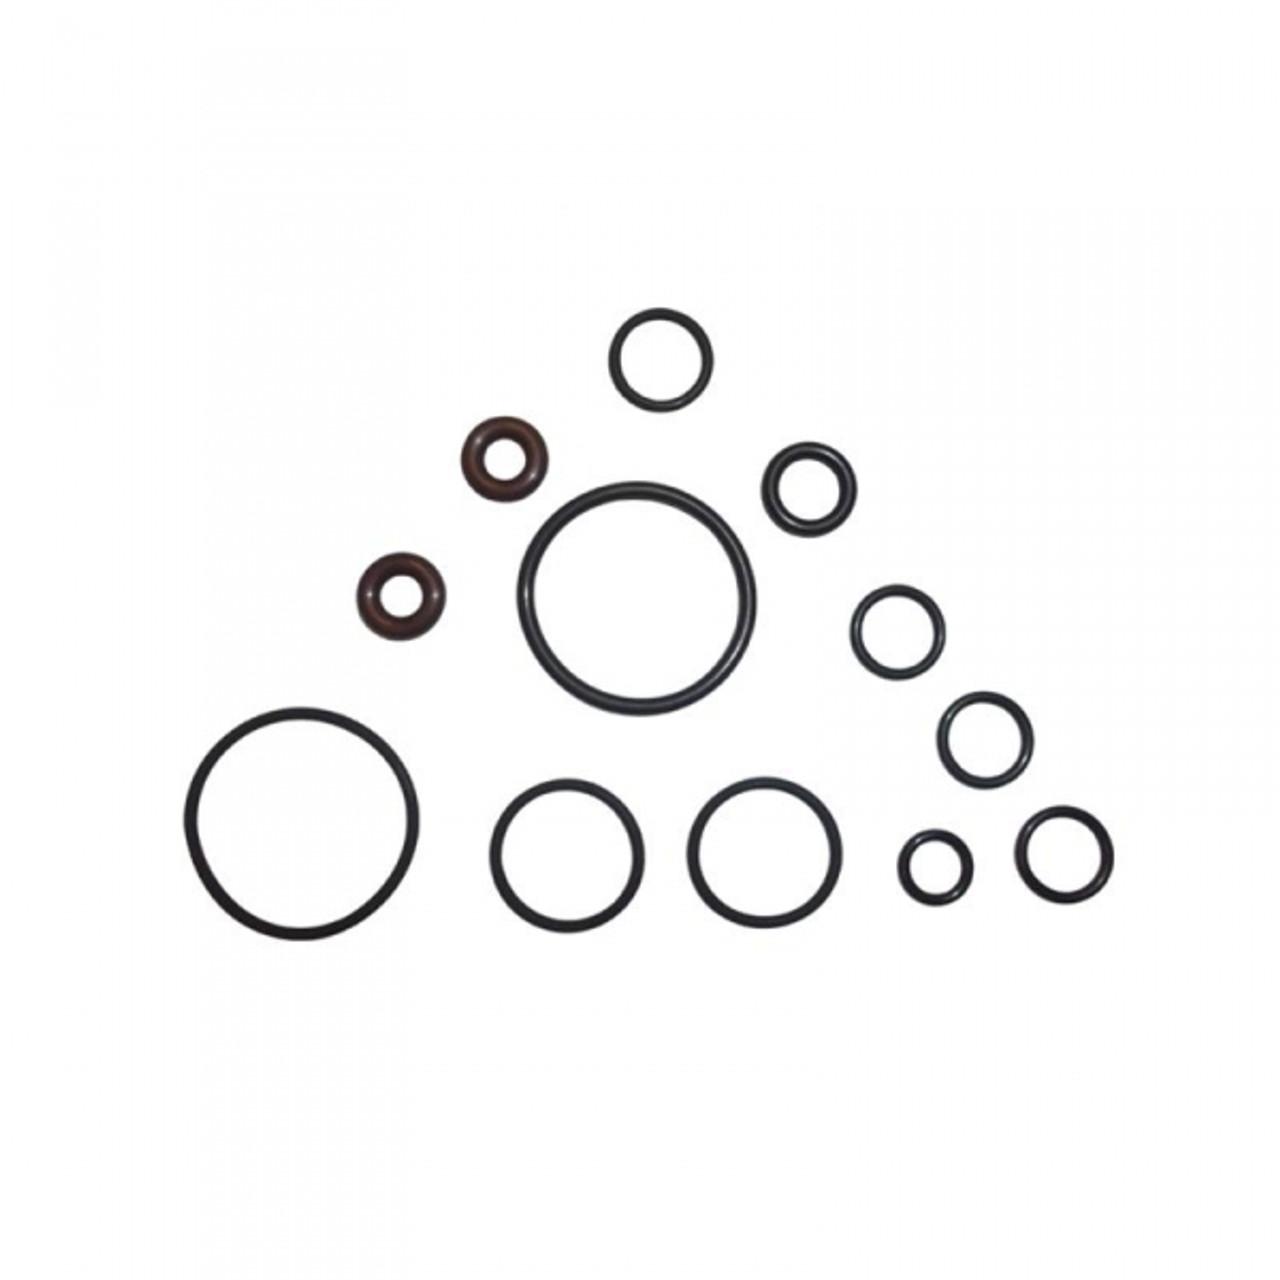 Bostech Fuel Filter Housing Seal Kit For 7.3 Powerstroke